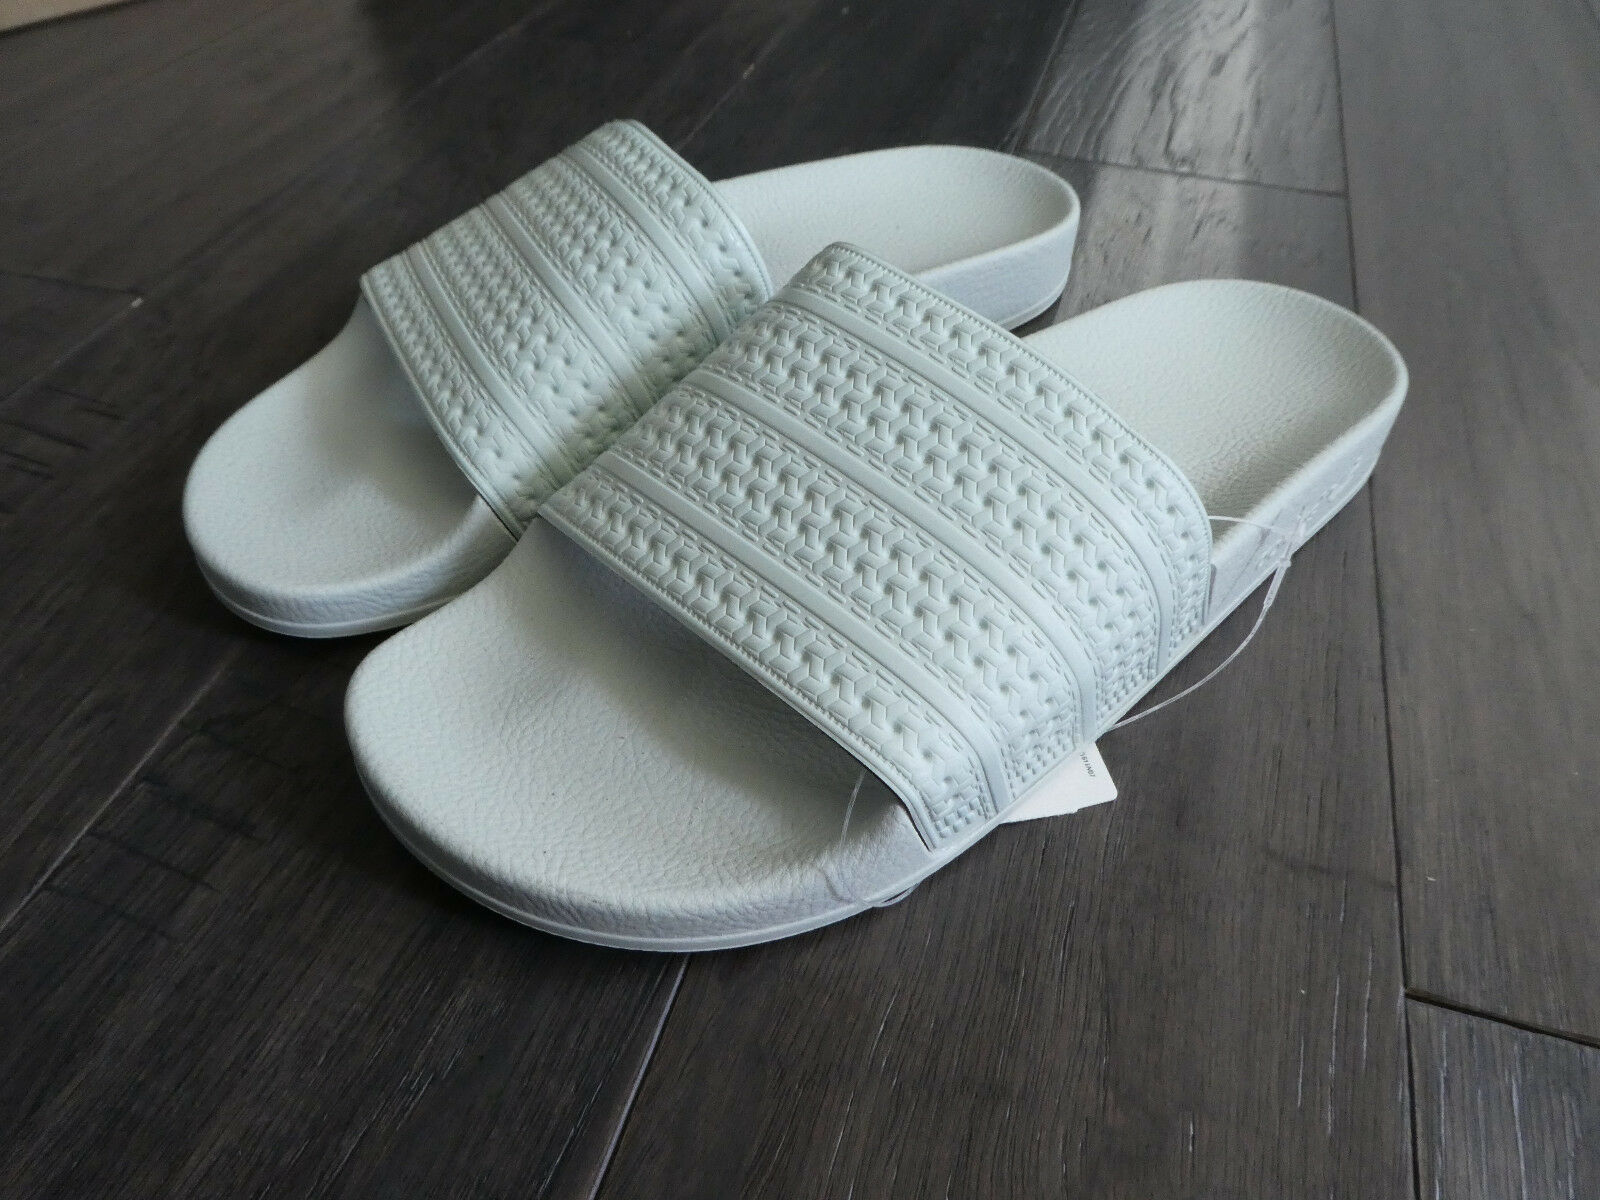 adidas - schuhe adilette männer neue made ba7540 in italy bettwäsche grüne ba7540 made 3535b5